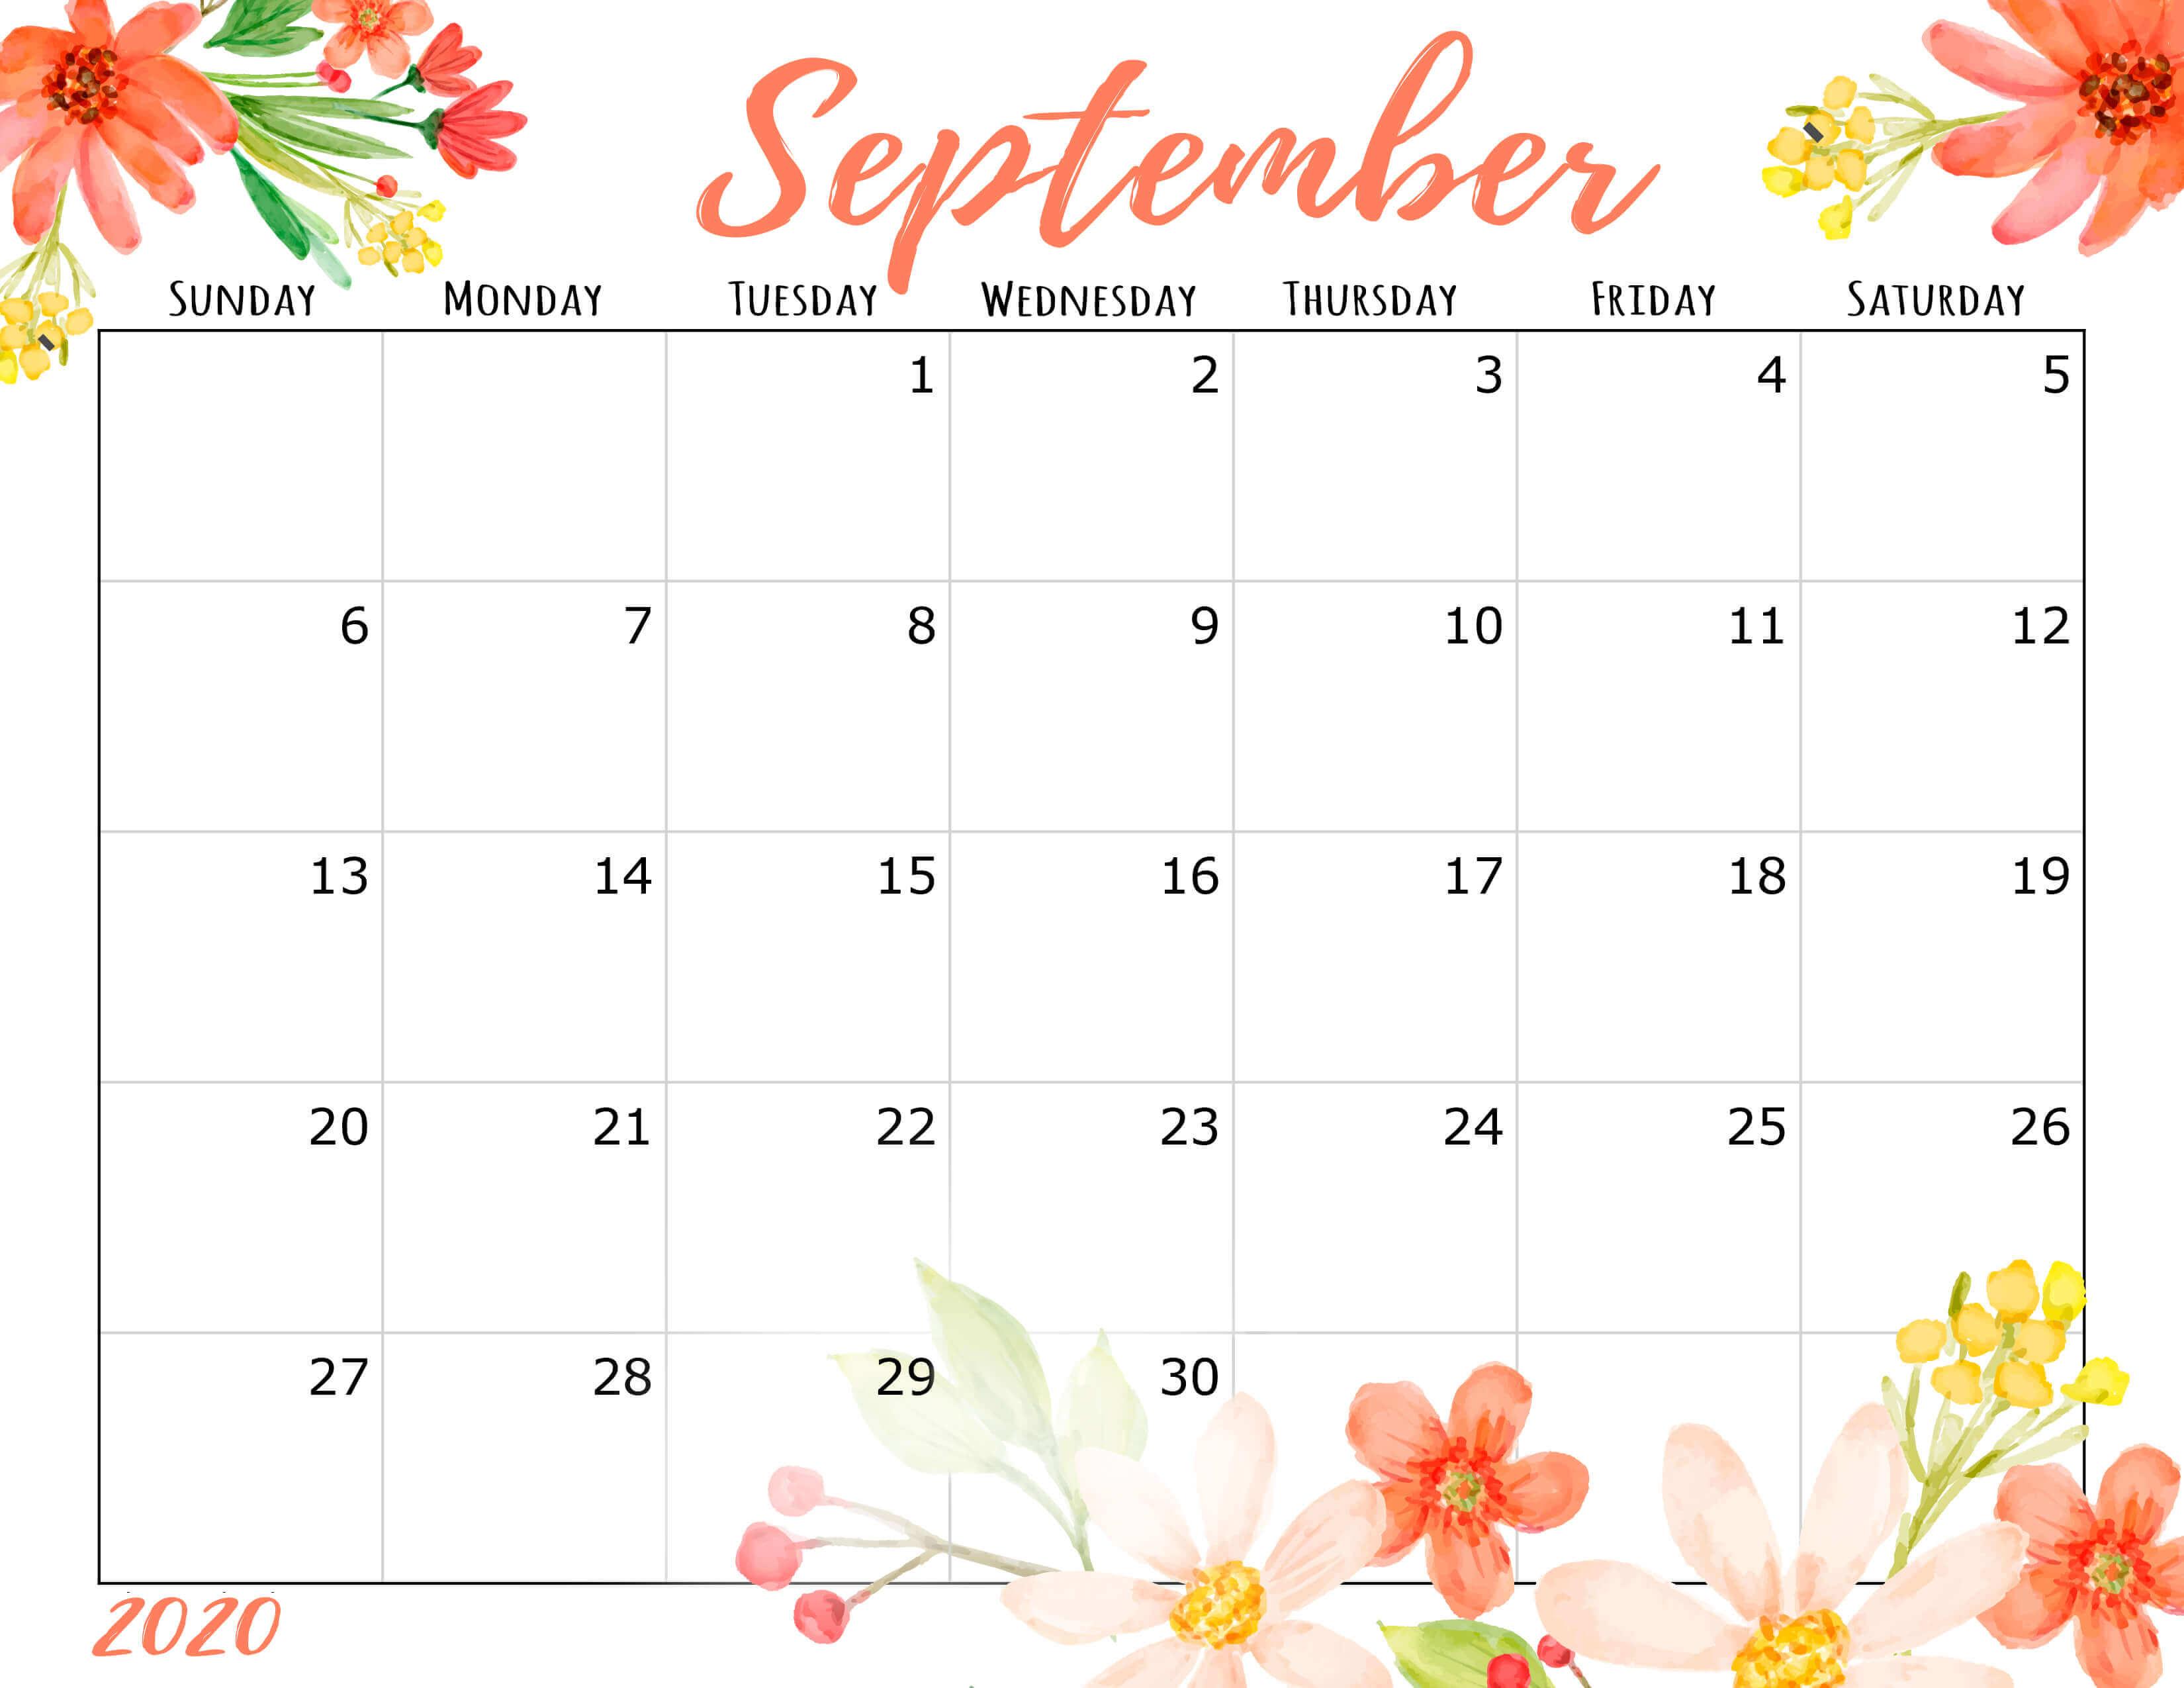 Cute September 2020 Desk Calendar